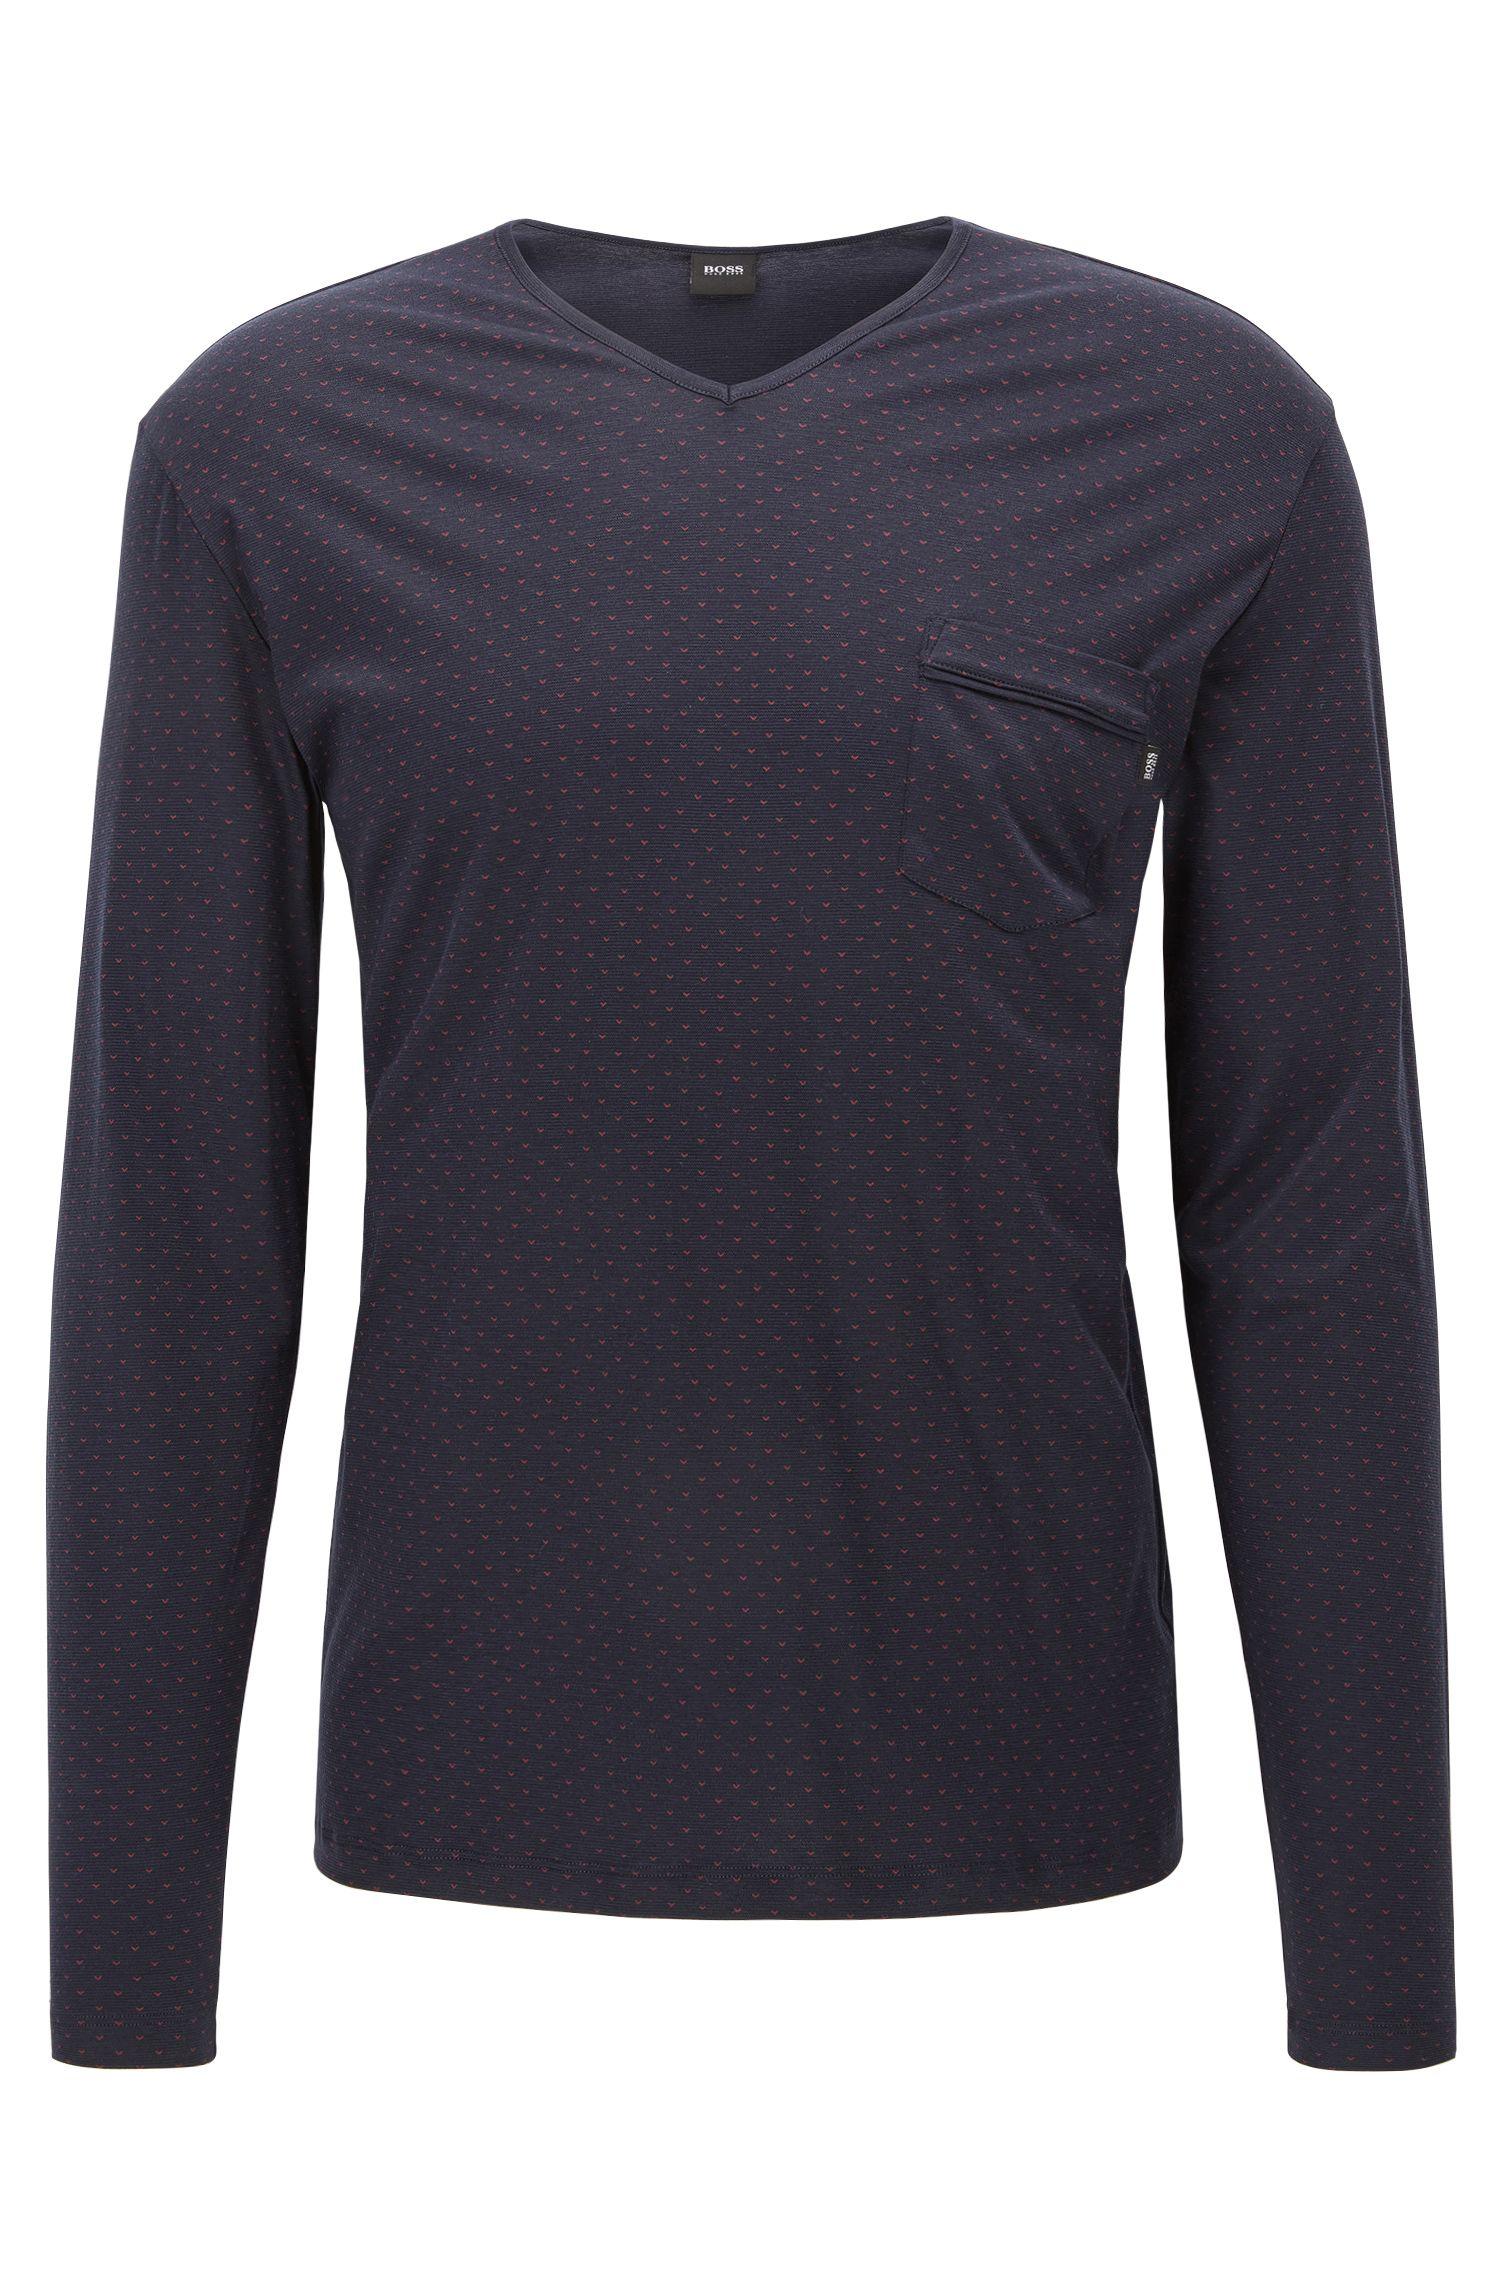 Camiseta regular fit en algodón y modal